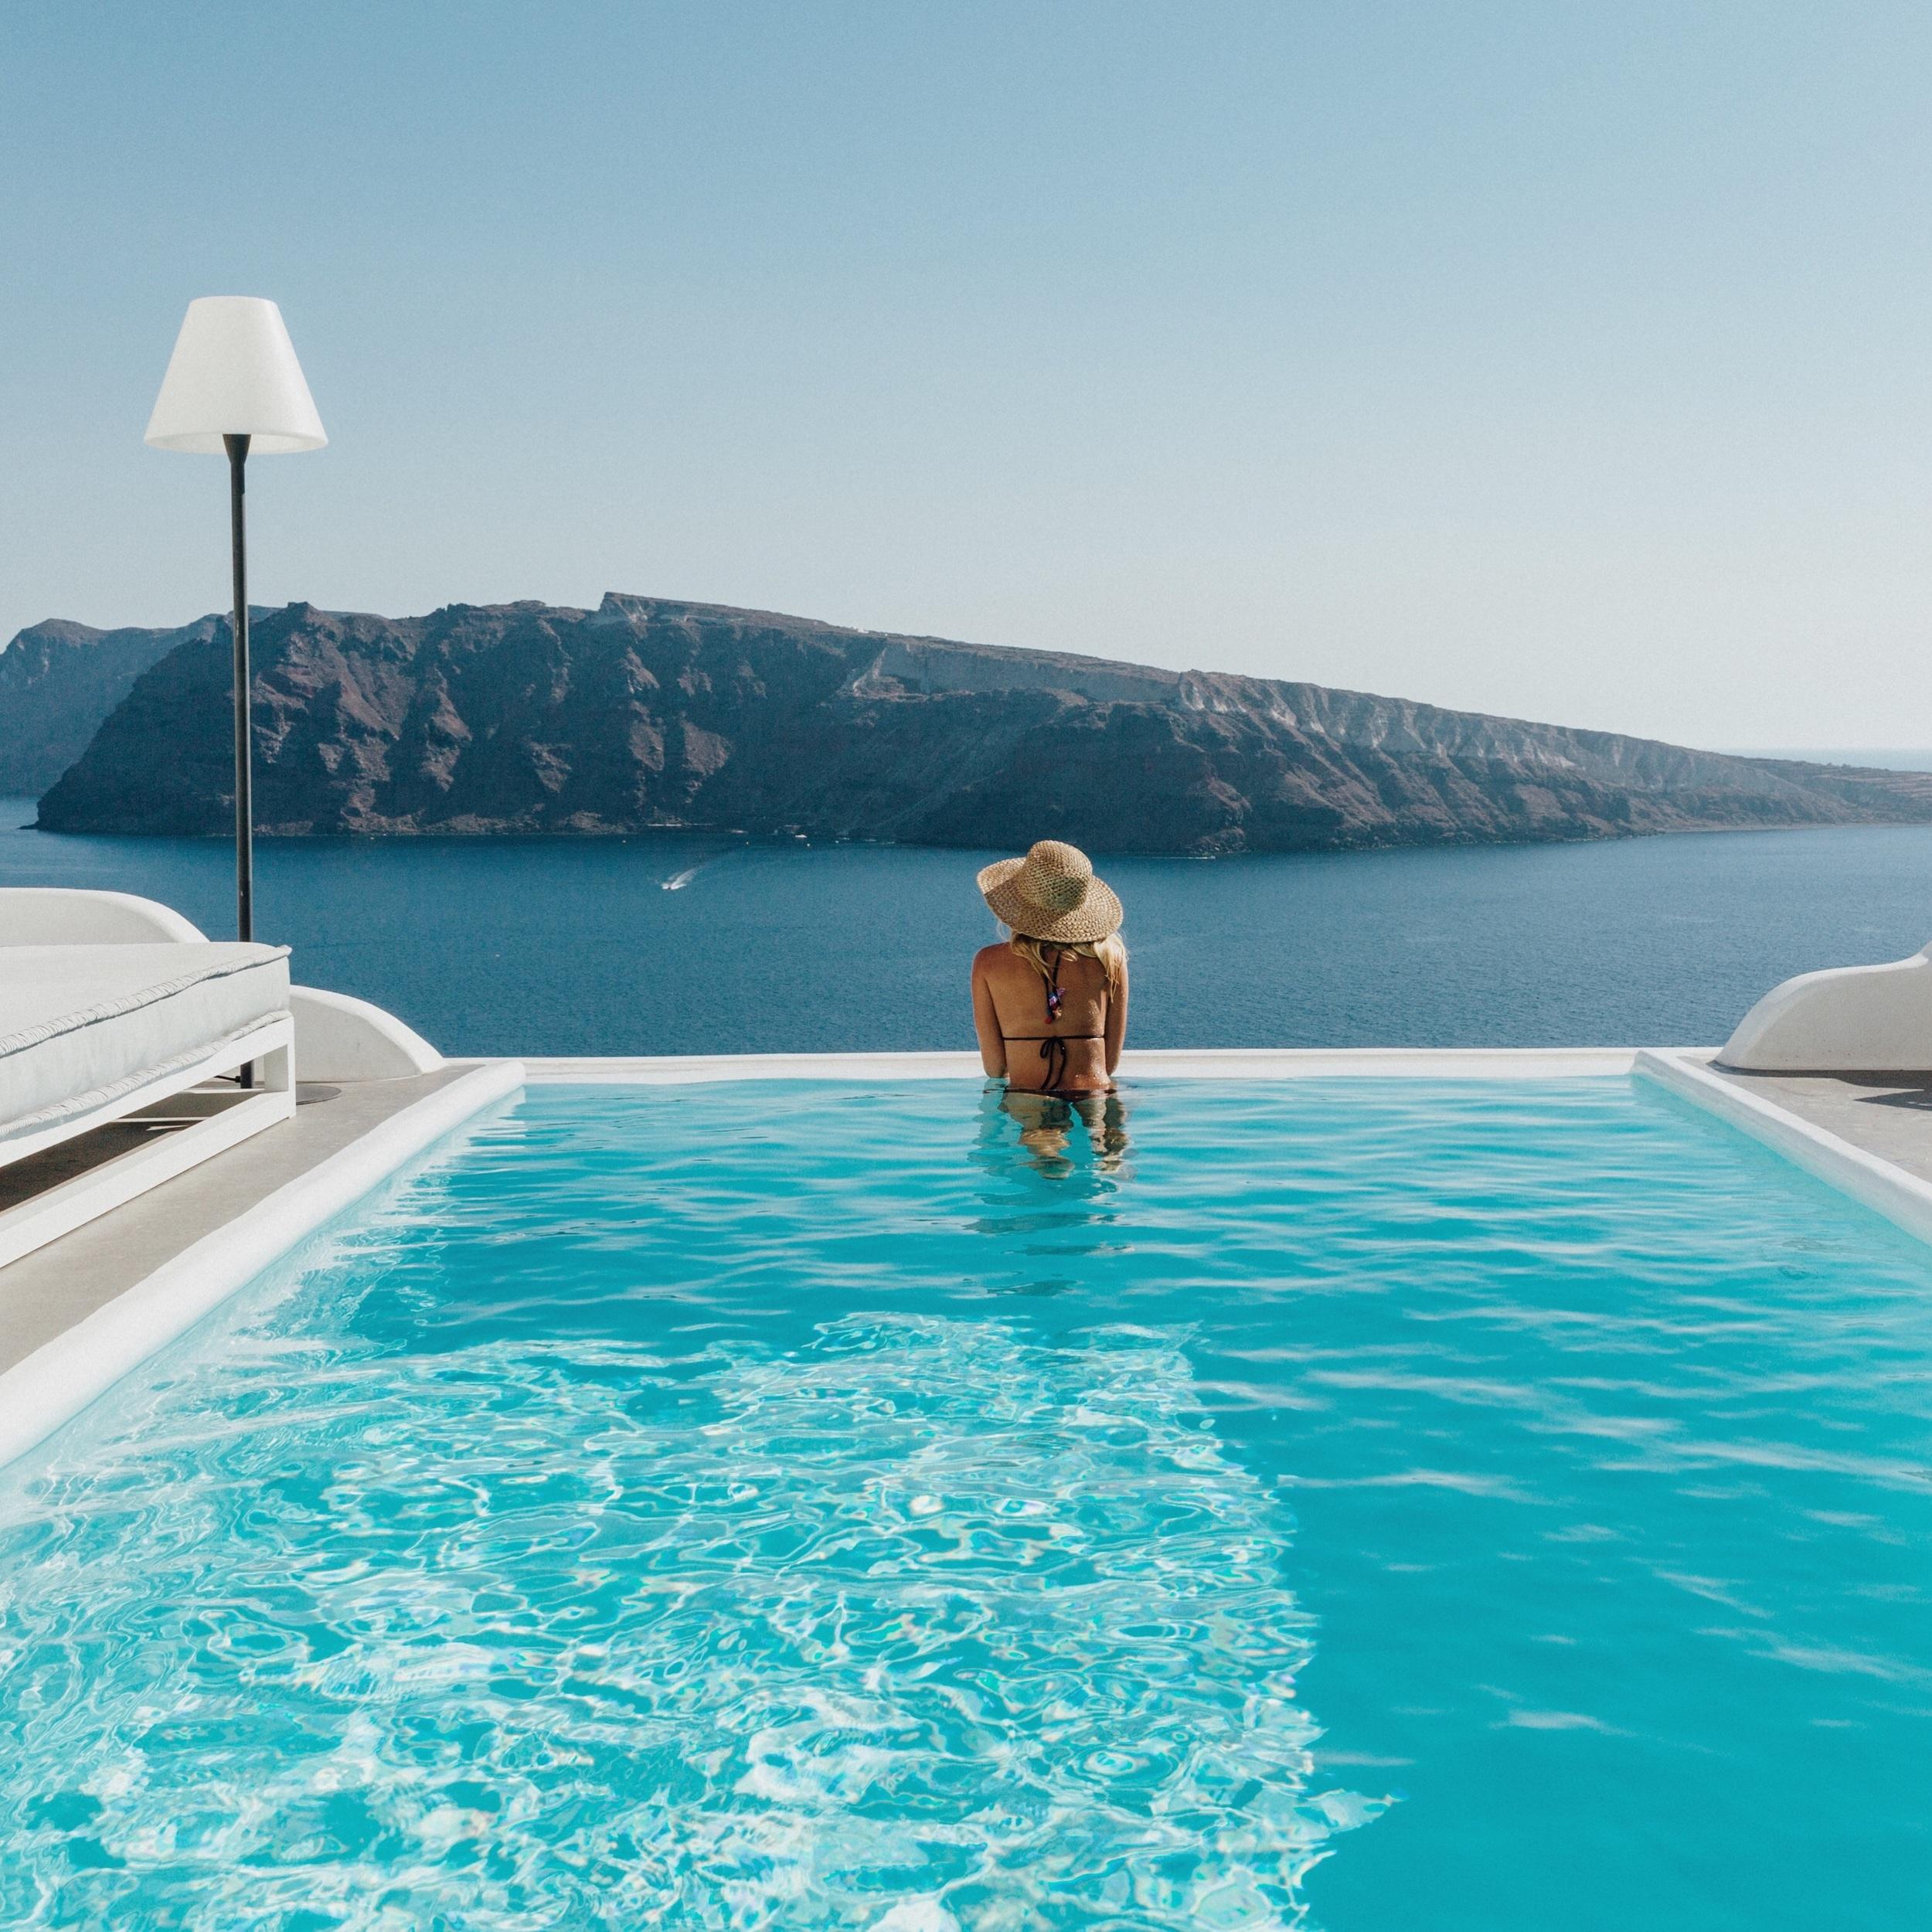 Poolside at Charisma Suites, bikini: Tigerlily Swimwear